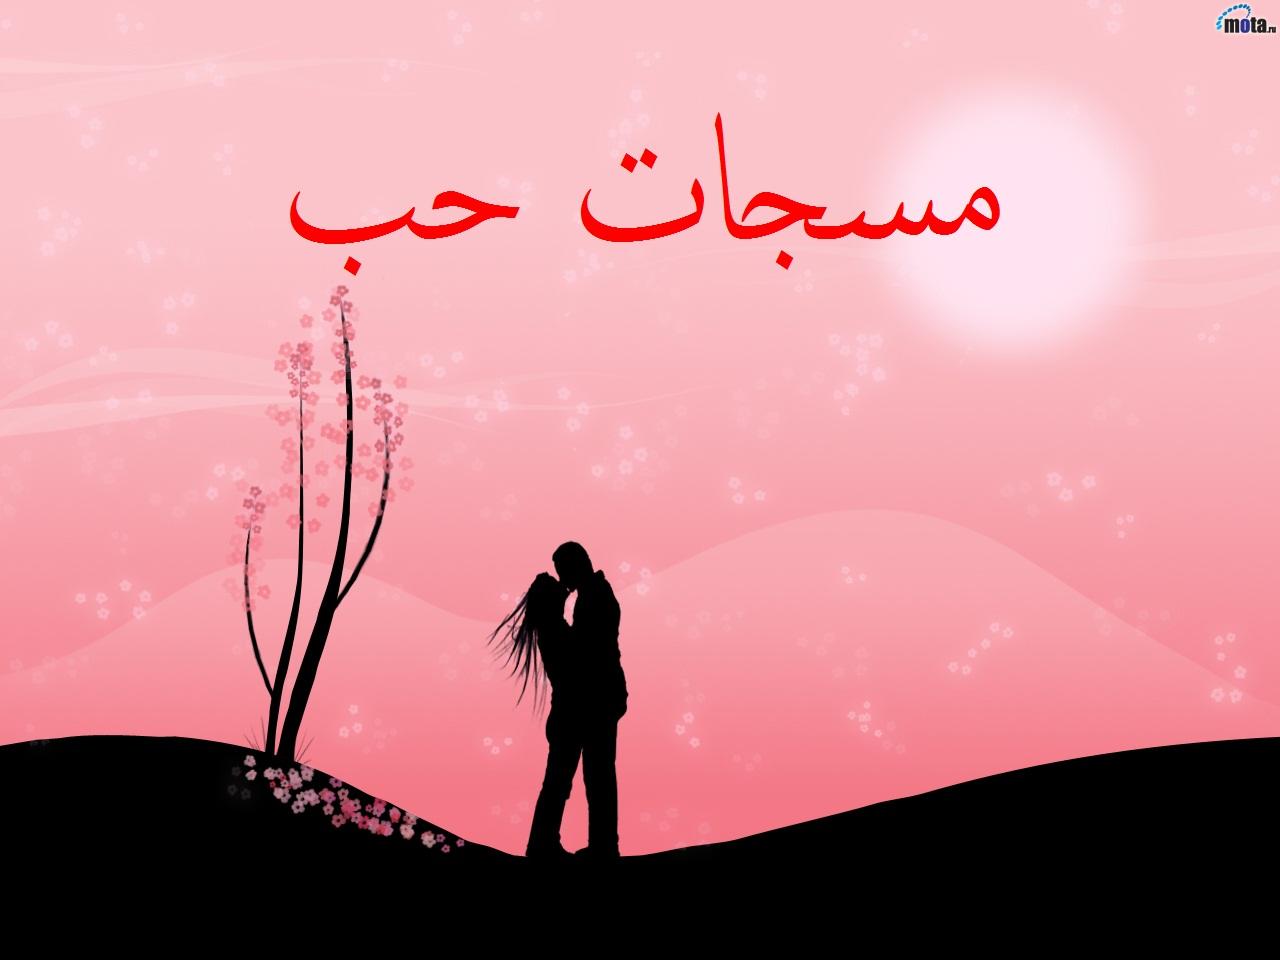 مسجات حب سعودية , رسائل حب سعودية 1435 , Love Letters Saudi Arabia